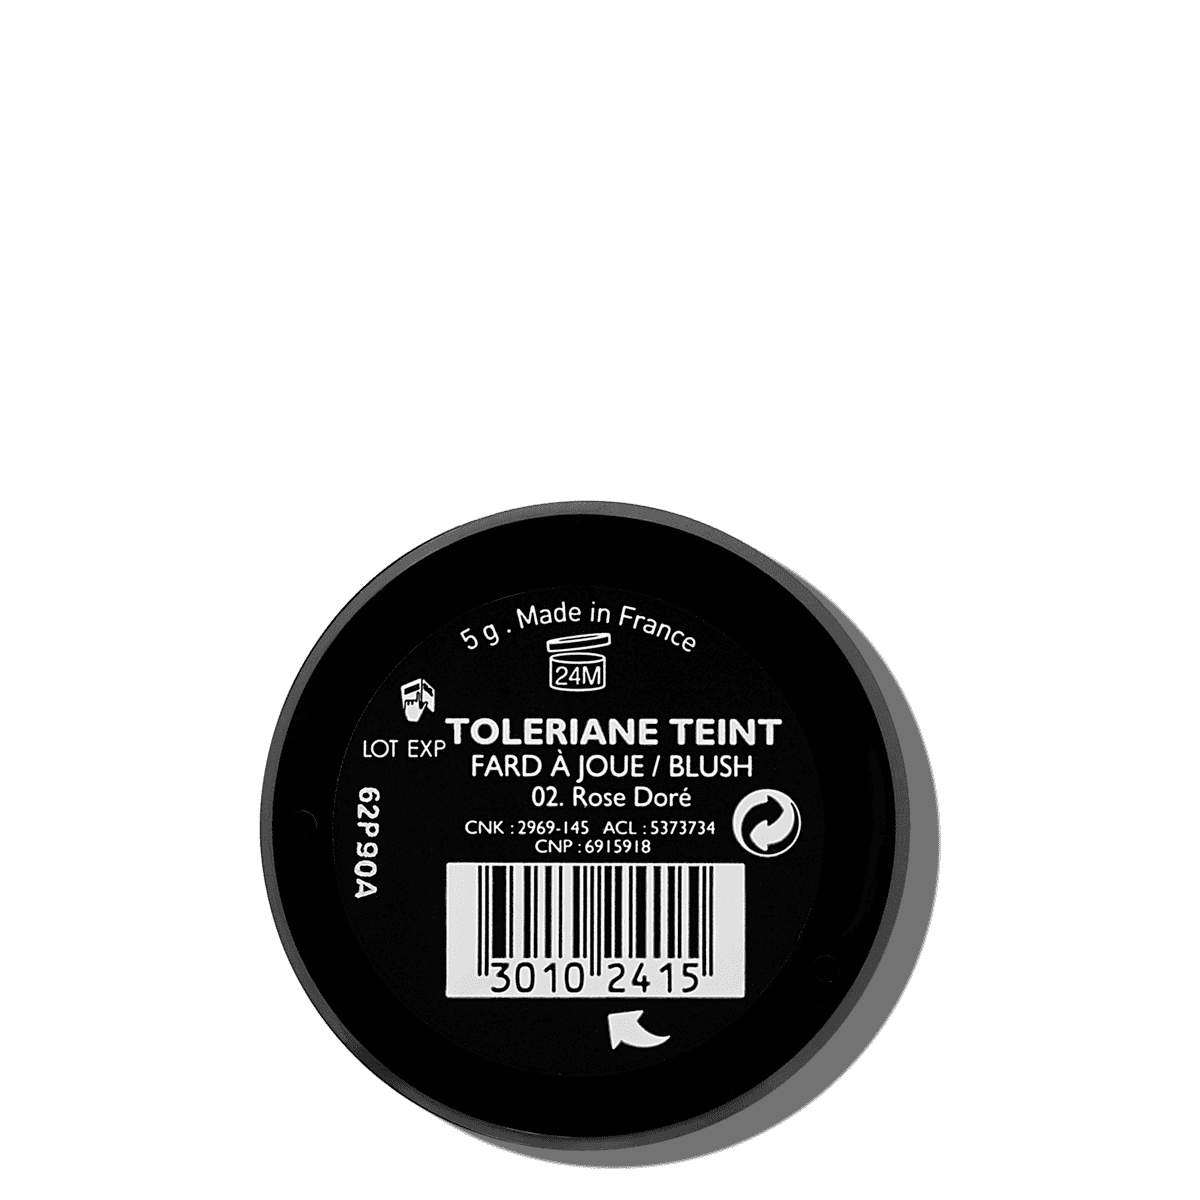 La Roche Posay Herkkä Toleriane Make up BLUSH GoldenPink 30102415 B